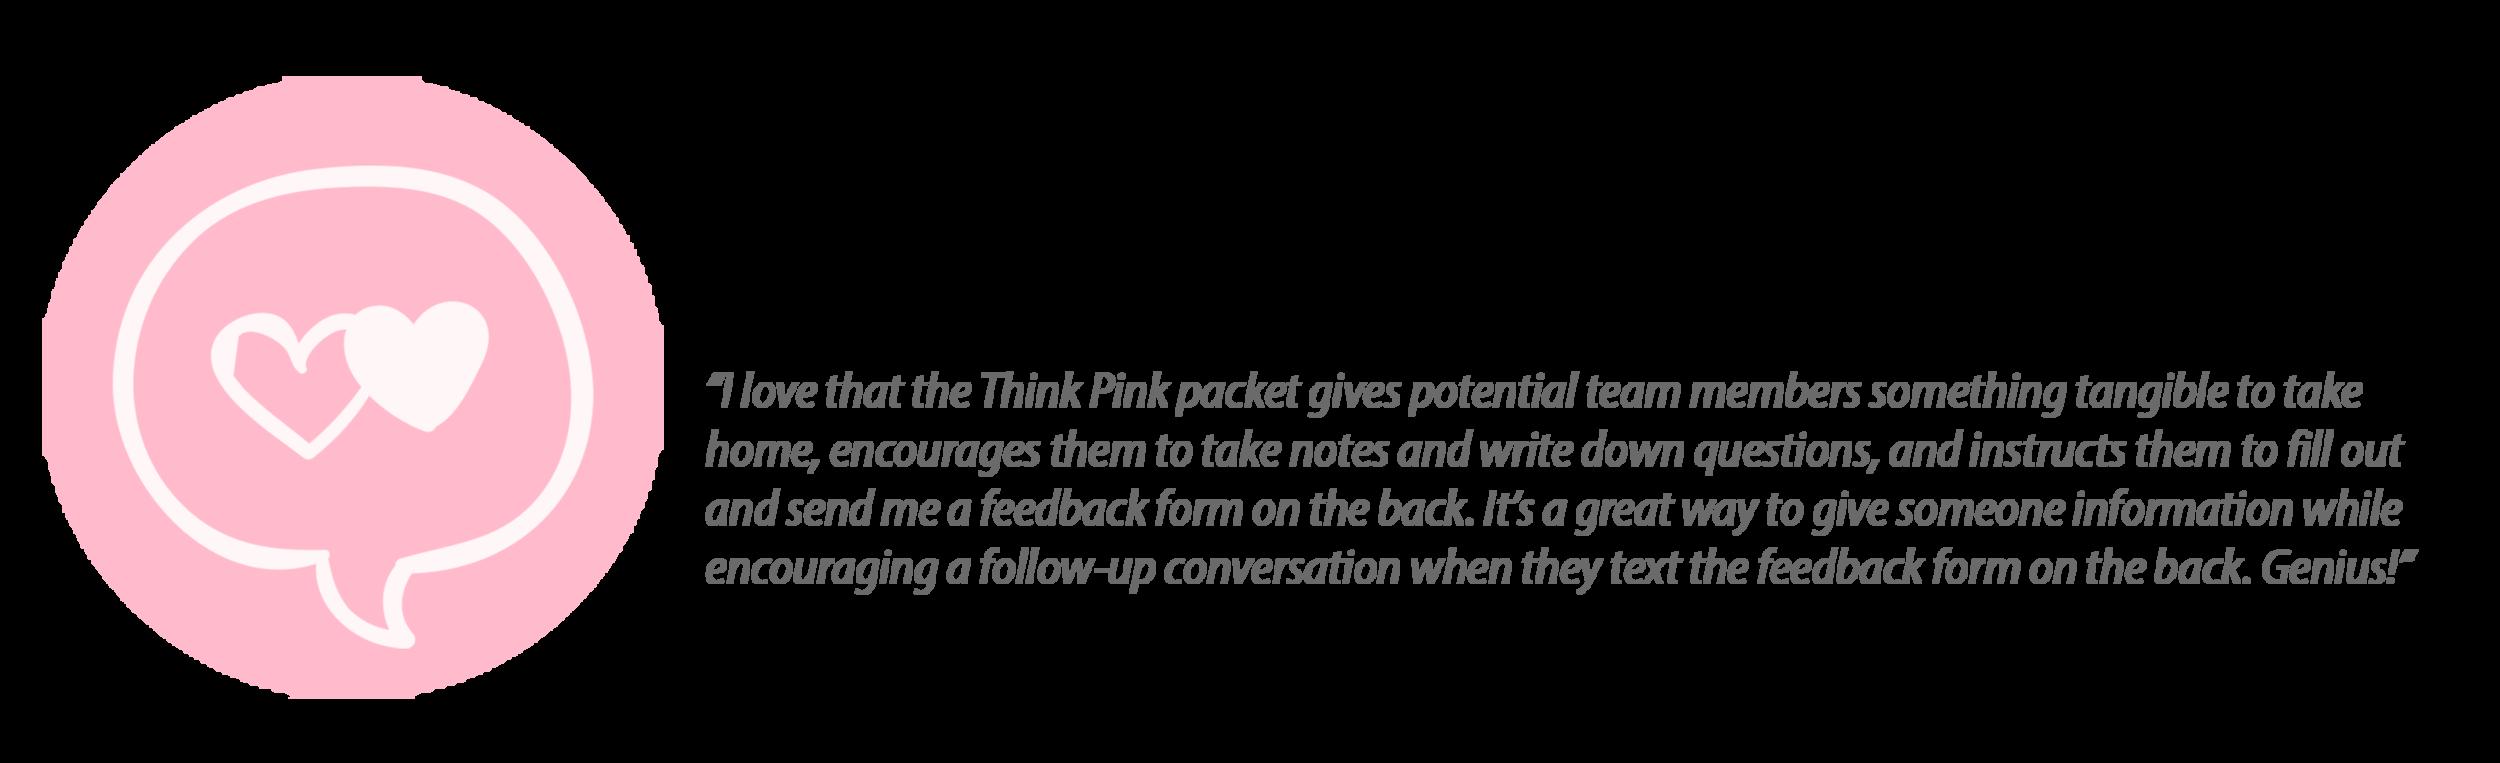 Becca Fretz Think Pink Packet.png